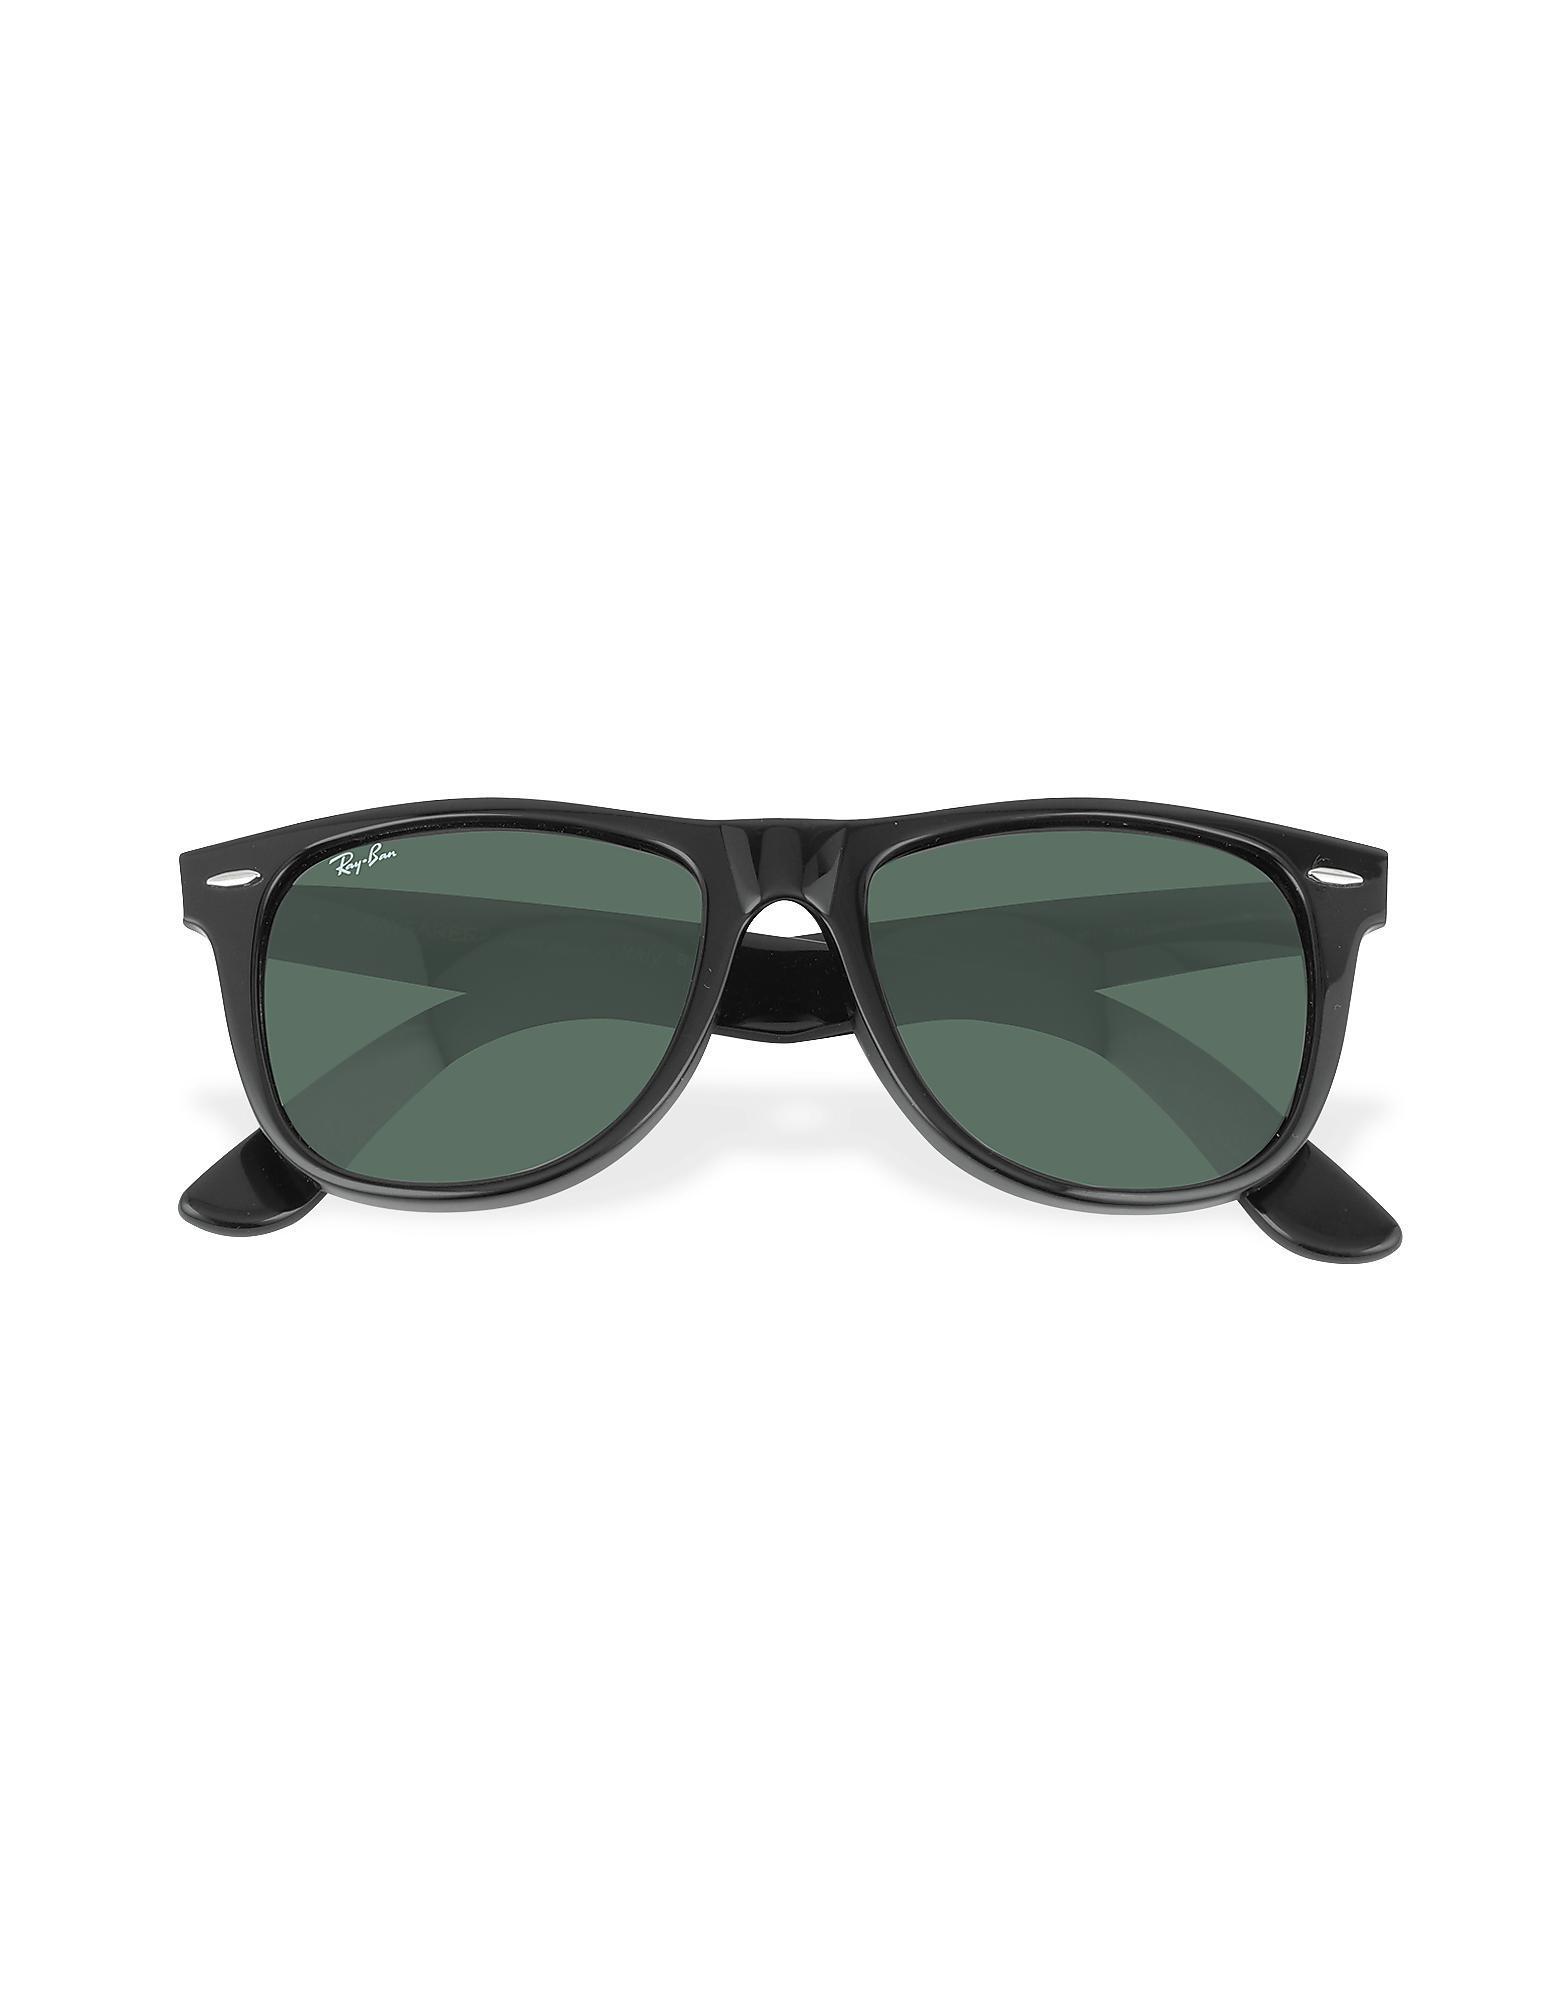 6b86d2bed3 ... denmark ray ban original wayfarer square acetate sunglasses in black  for men lyst 19fbf ae309